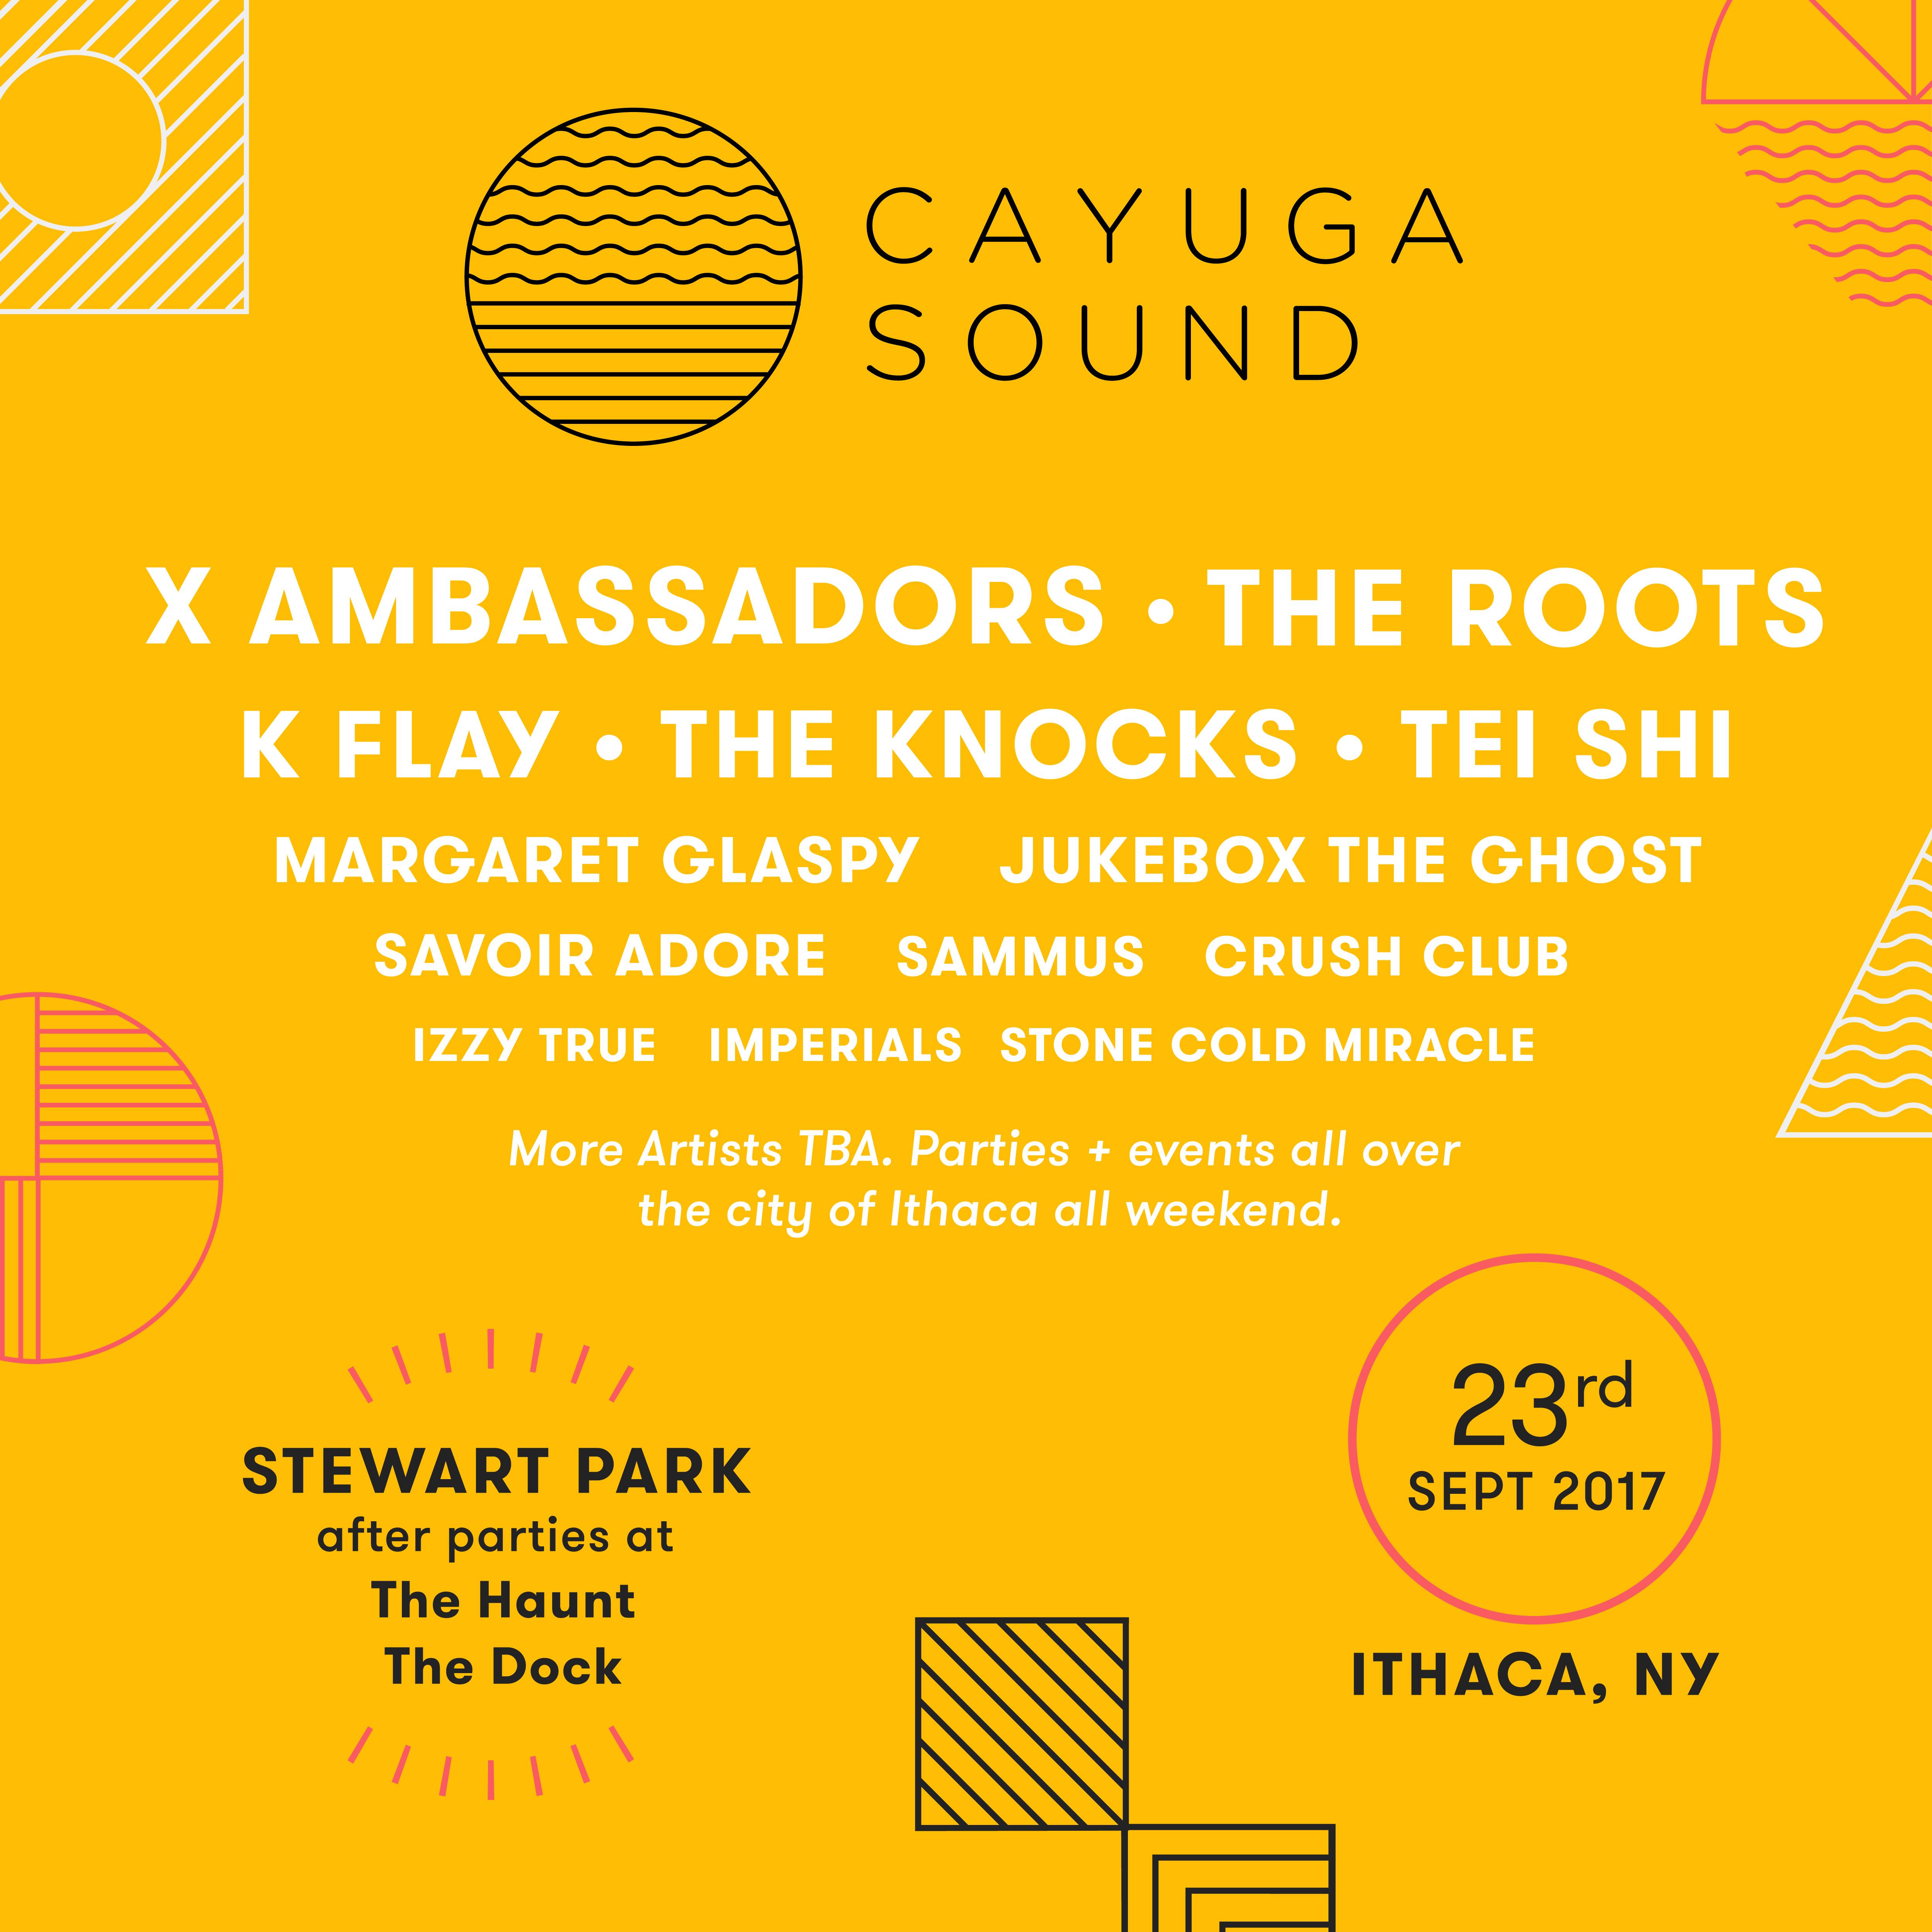 X Ambassadors Talk Cayuga Sound Festival